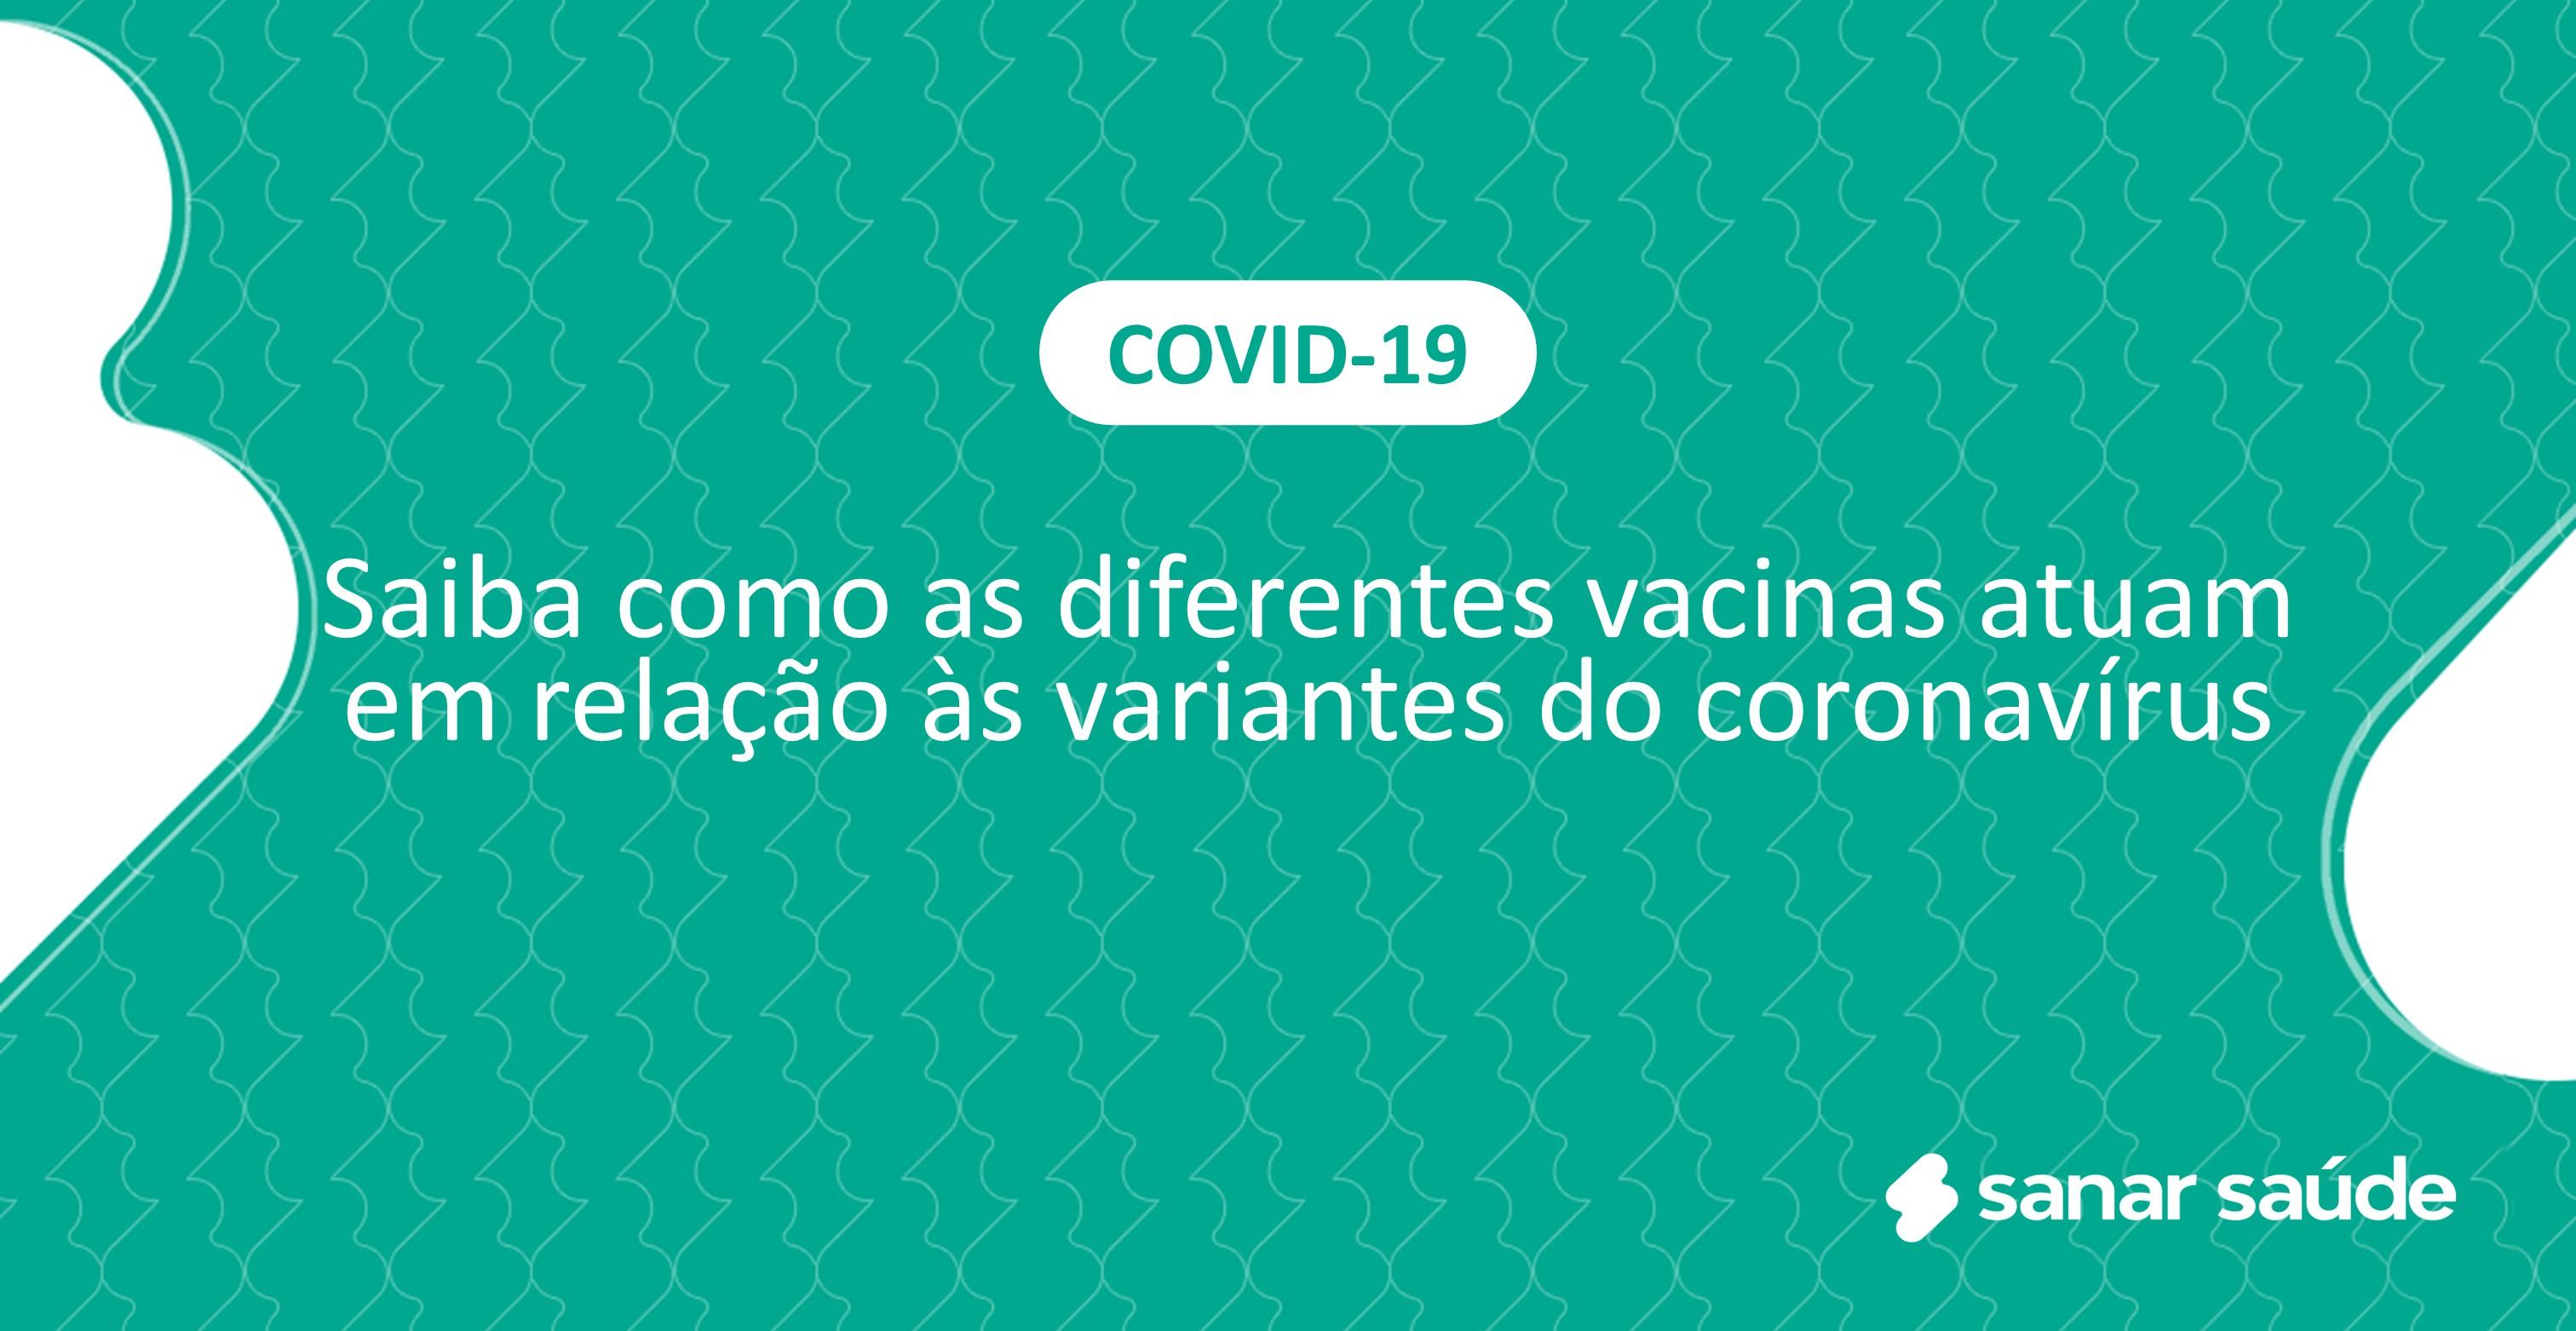 a-vacina-variantes.jpg (436 KB)